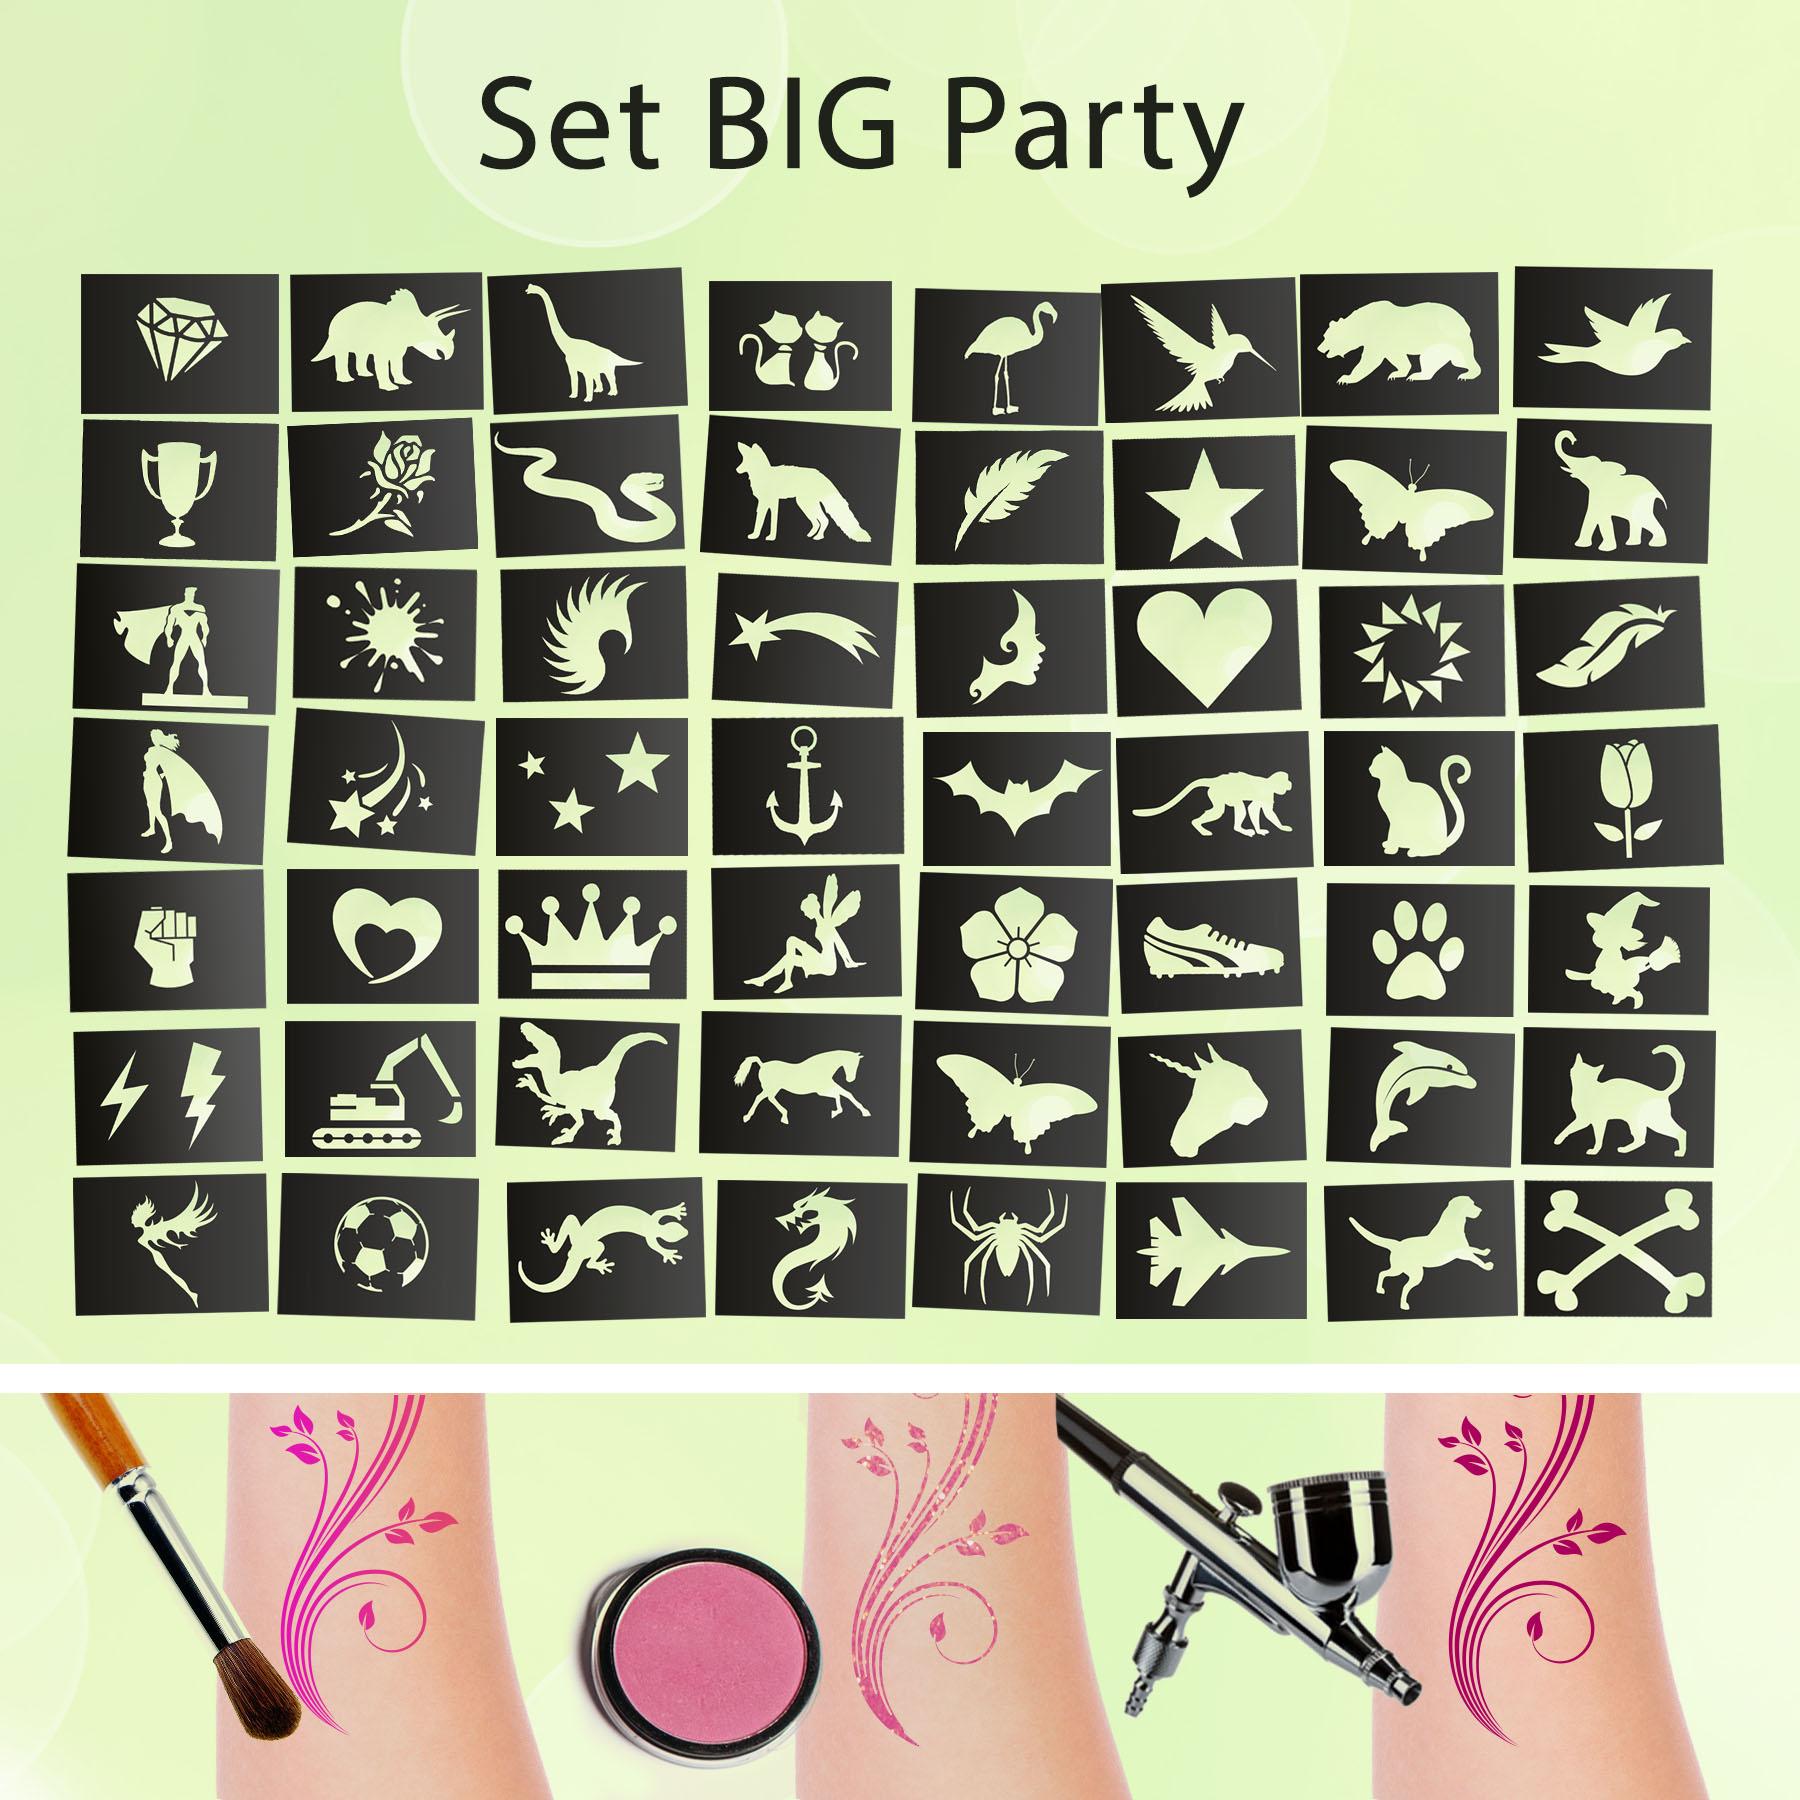 Tattoo Schablonen SET BIG Party (56 Stück) Selbstklebend Kinderschminken Airbrush